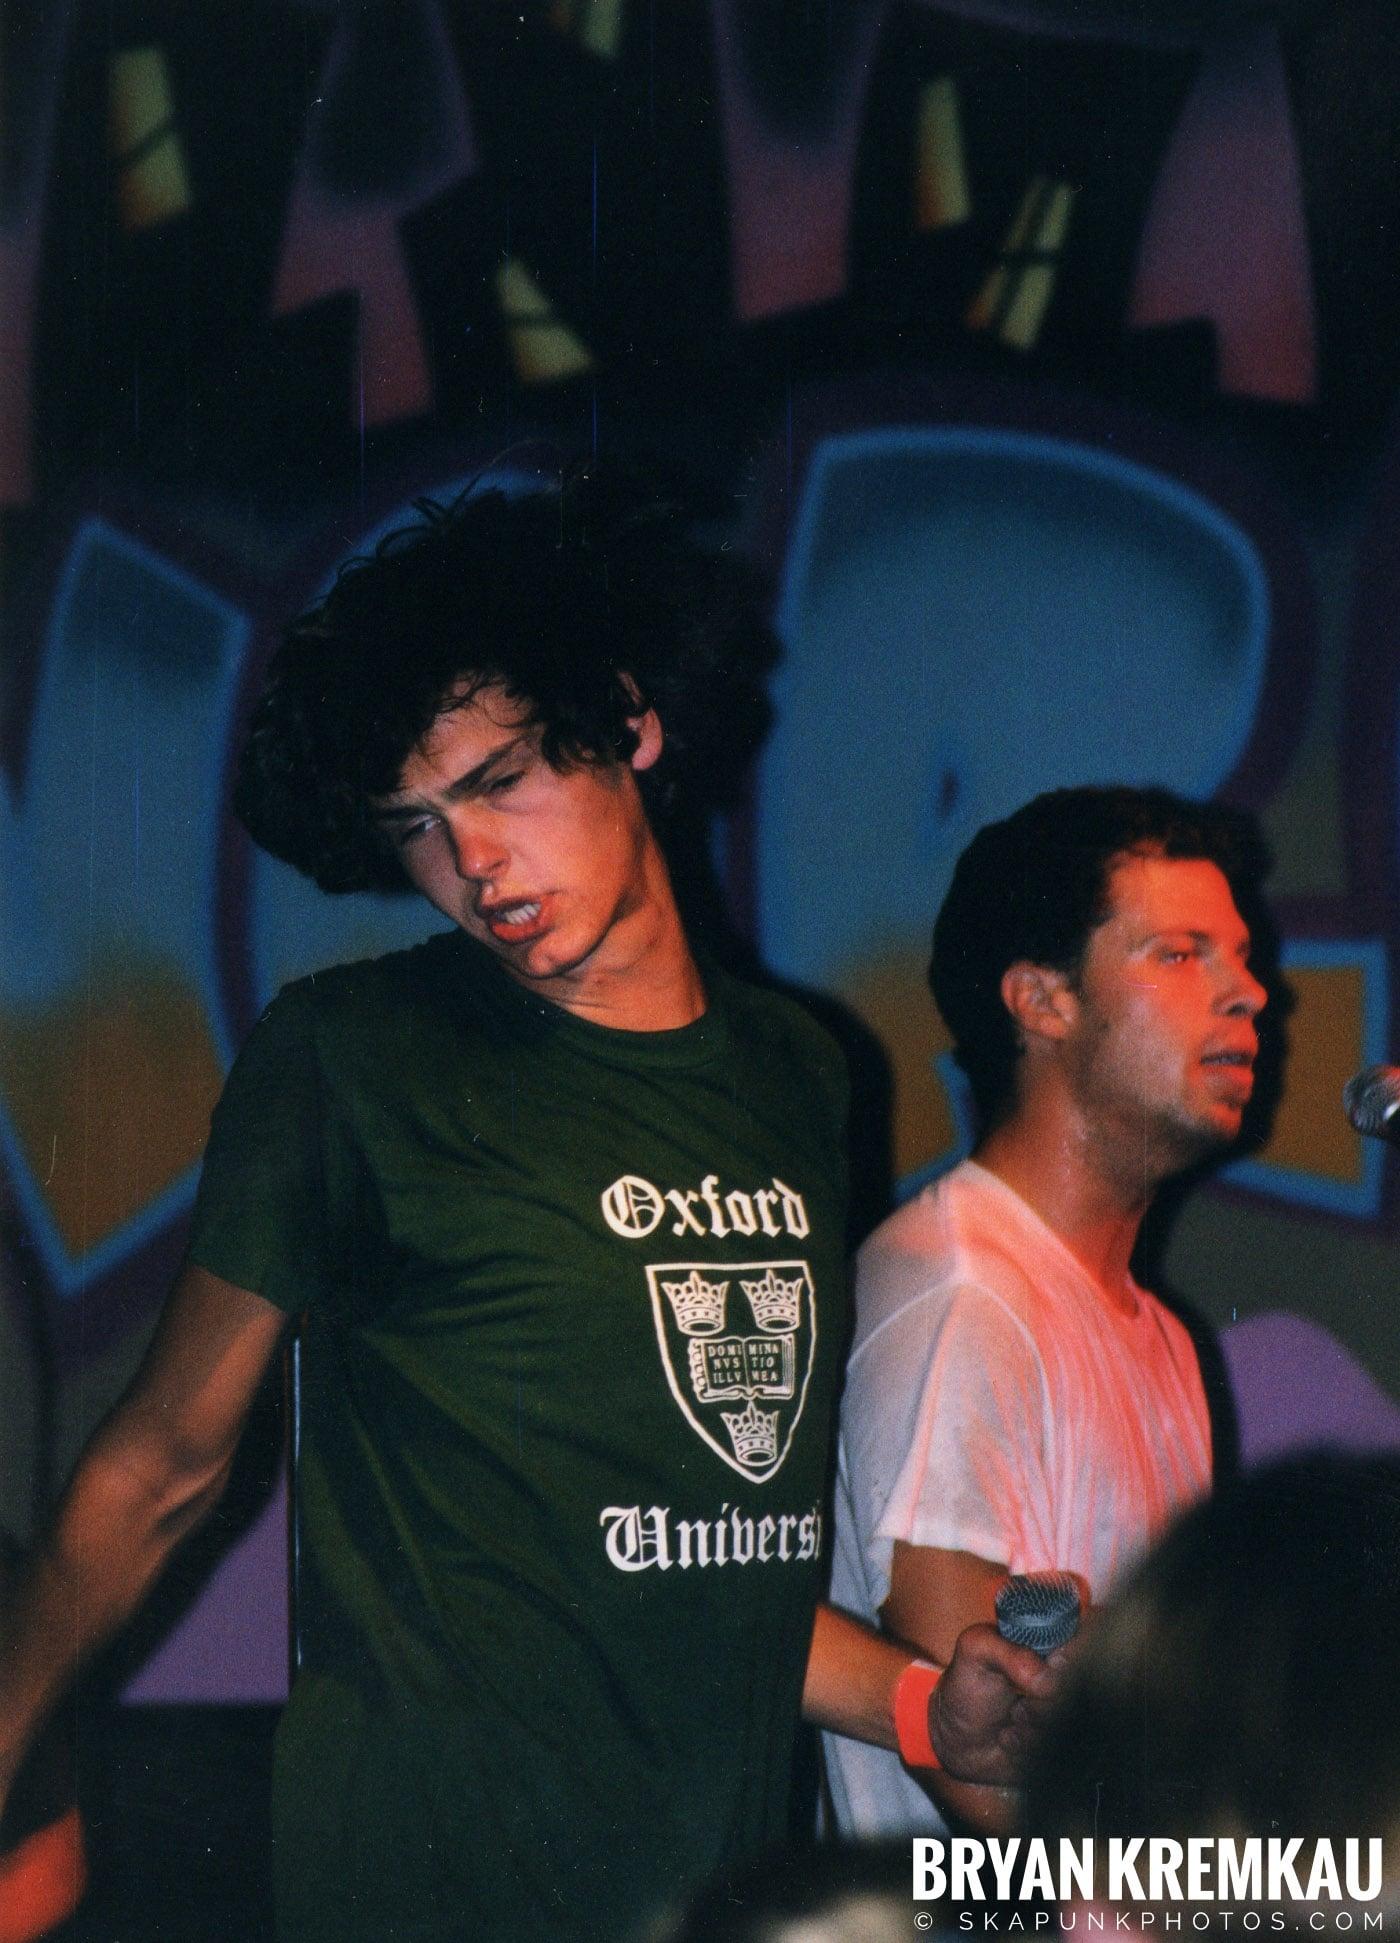 Slow Gherkin @ Skater's World, Wayne, NJ - 7.29.99 (13)